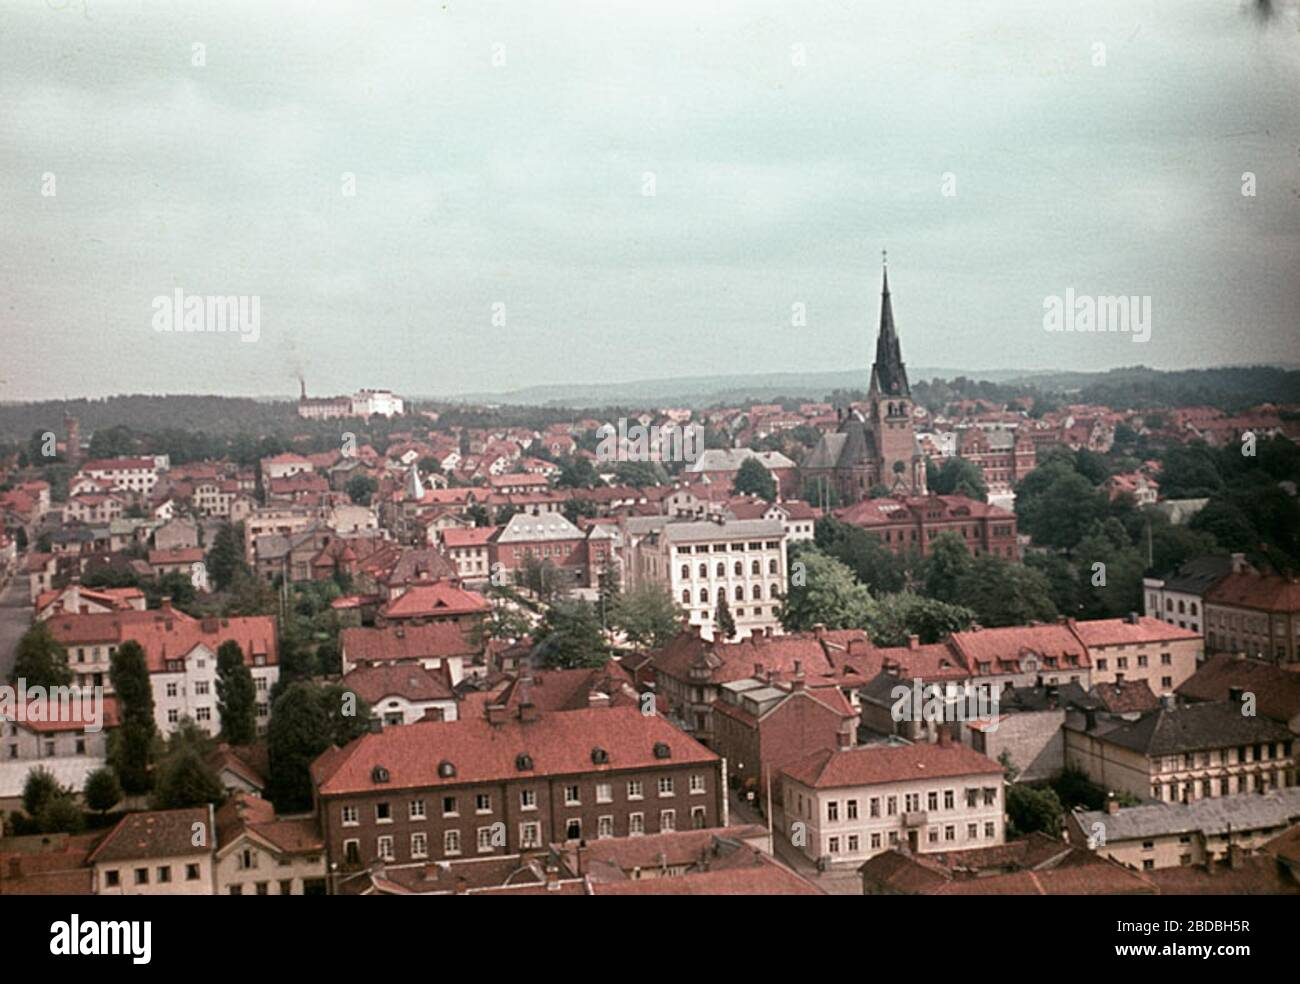 Fil:Bors, Vstergtland, Sweden (14974428431).jpg